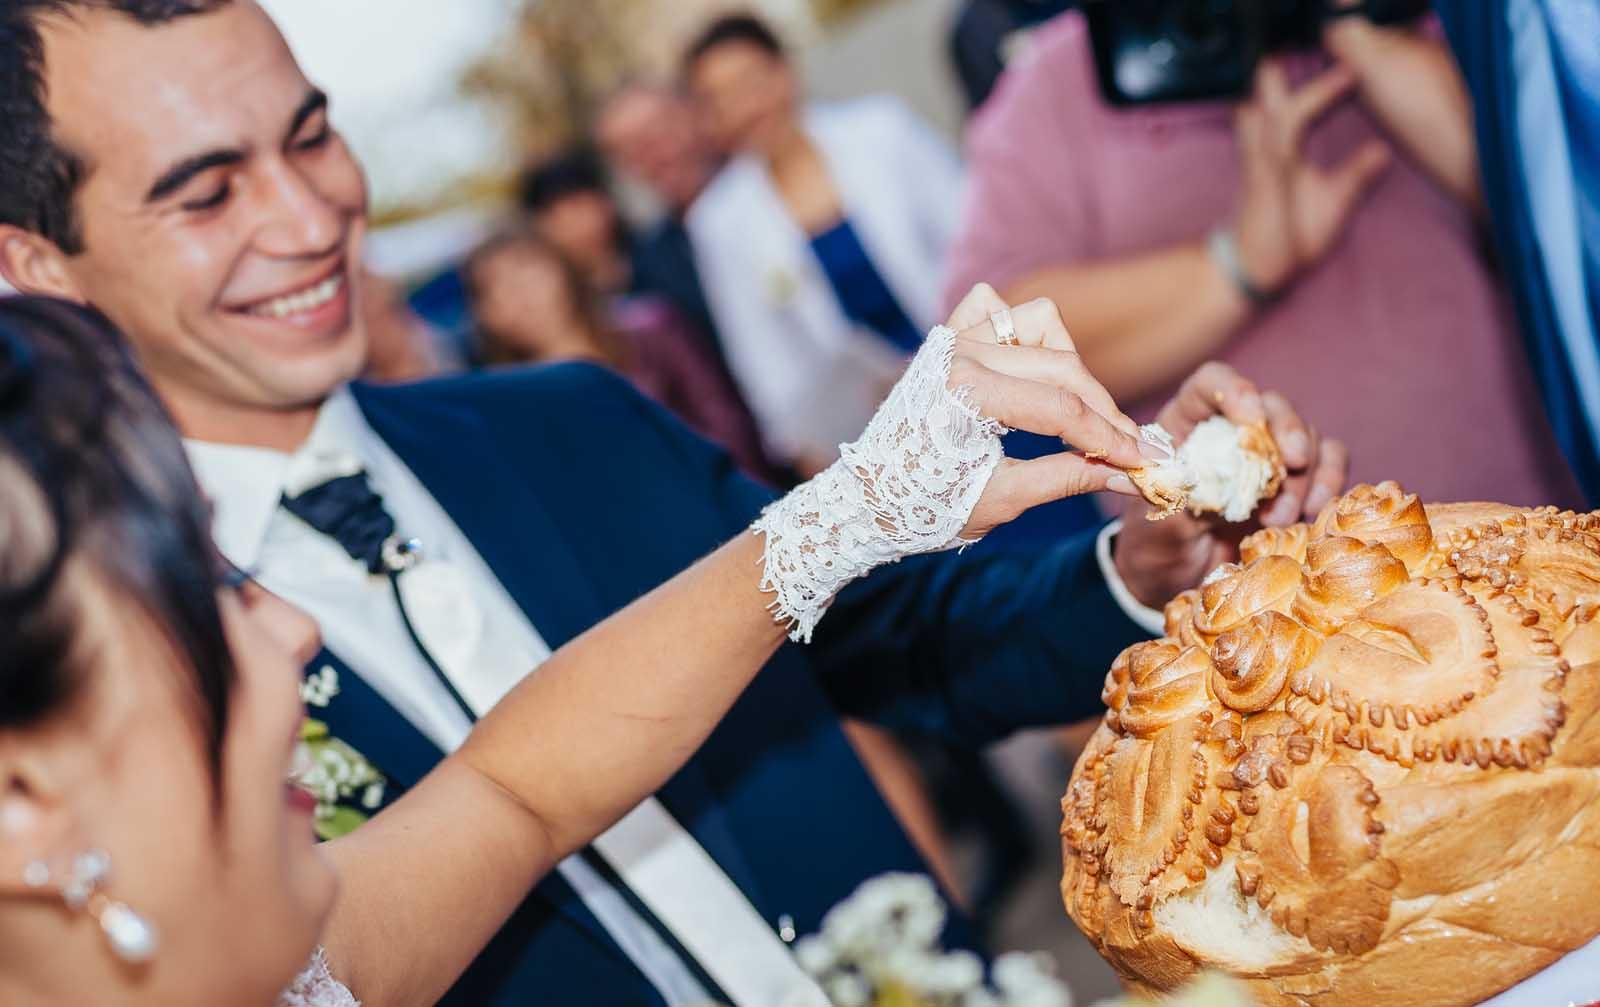 Polish Bread and salt ceremony